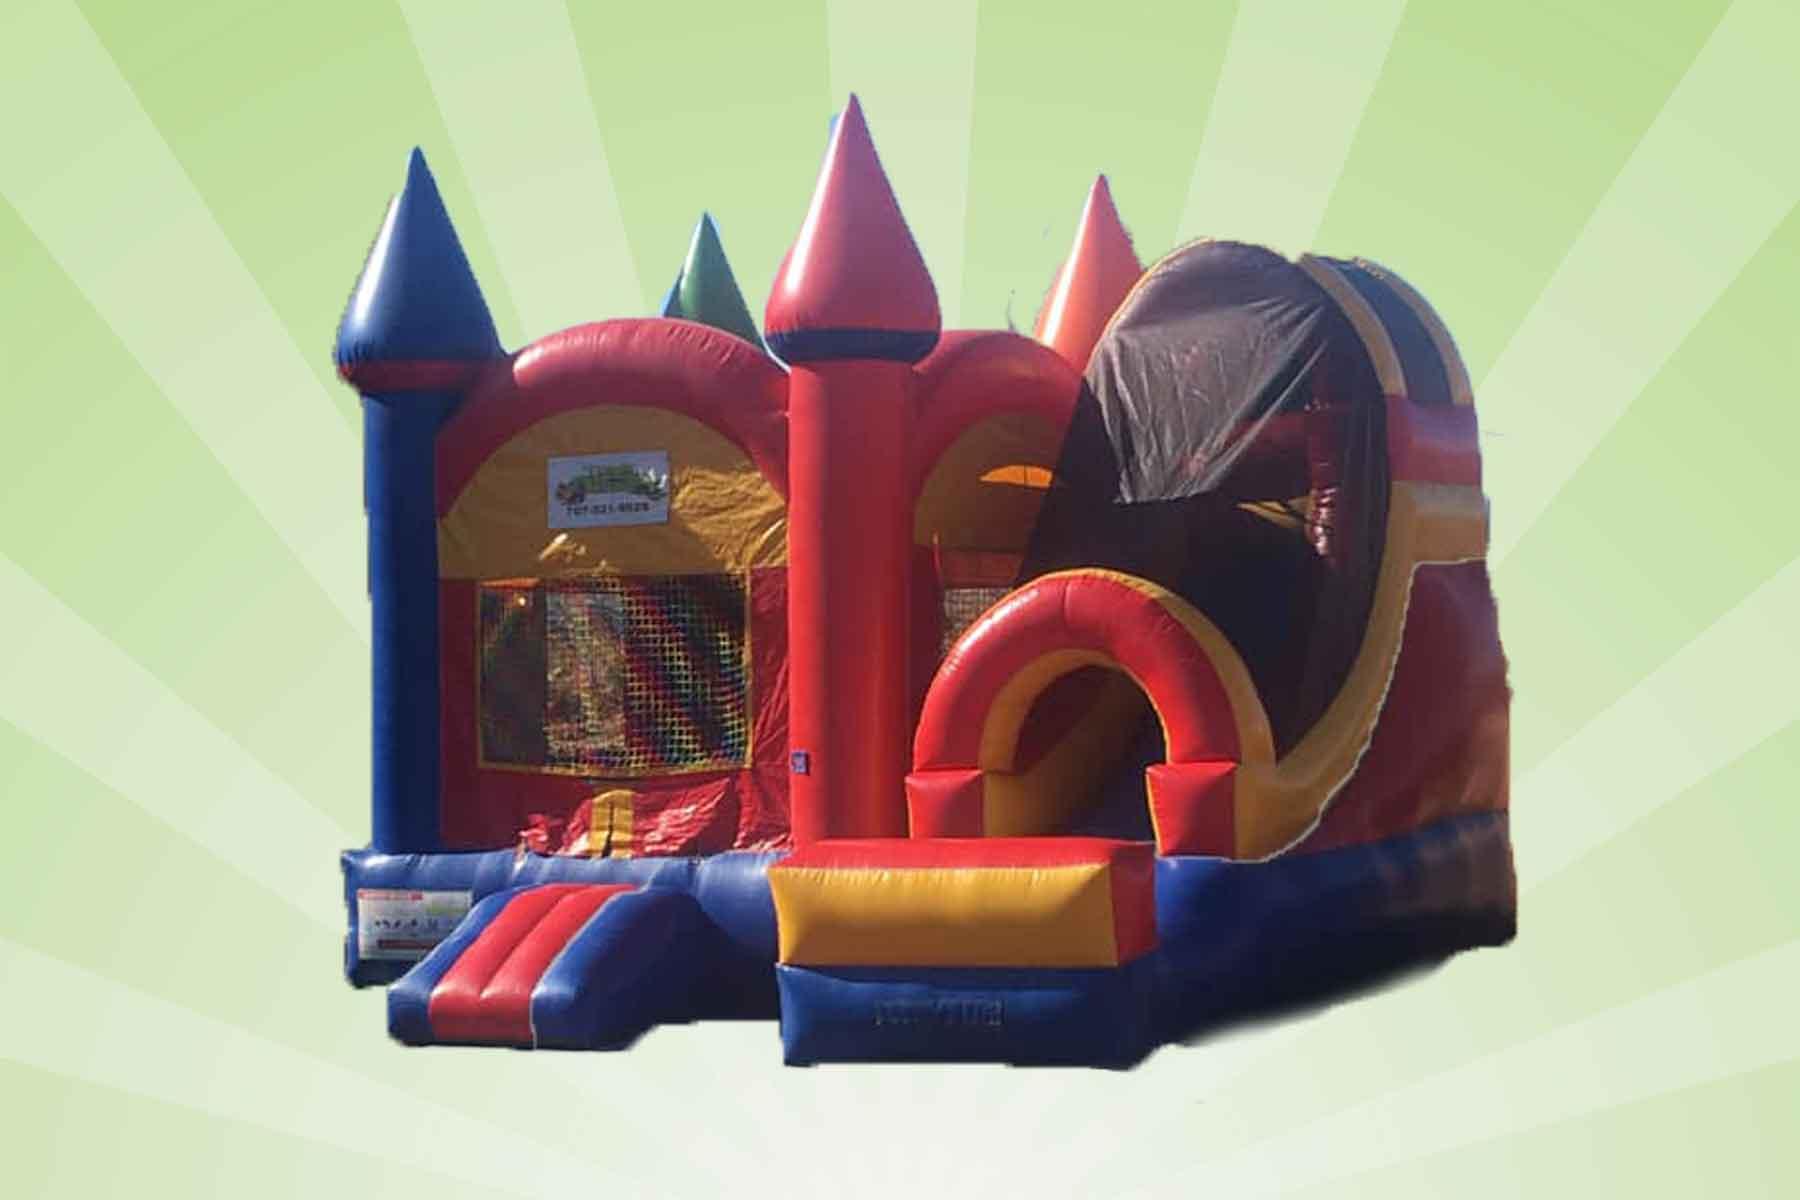 Middletown Jump and Slide Rentals